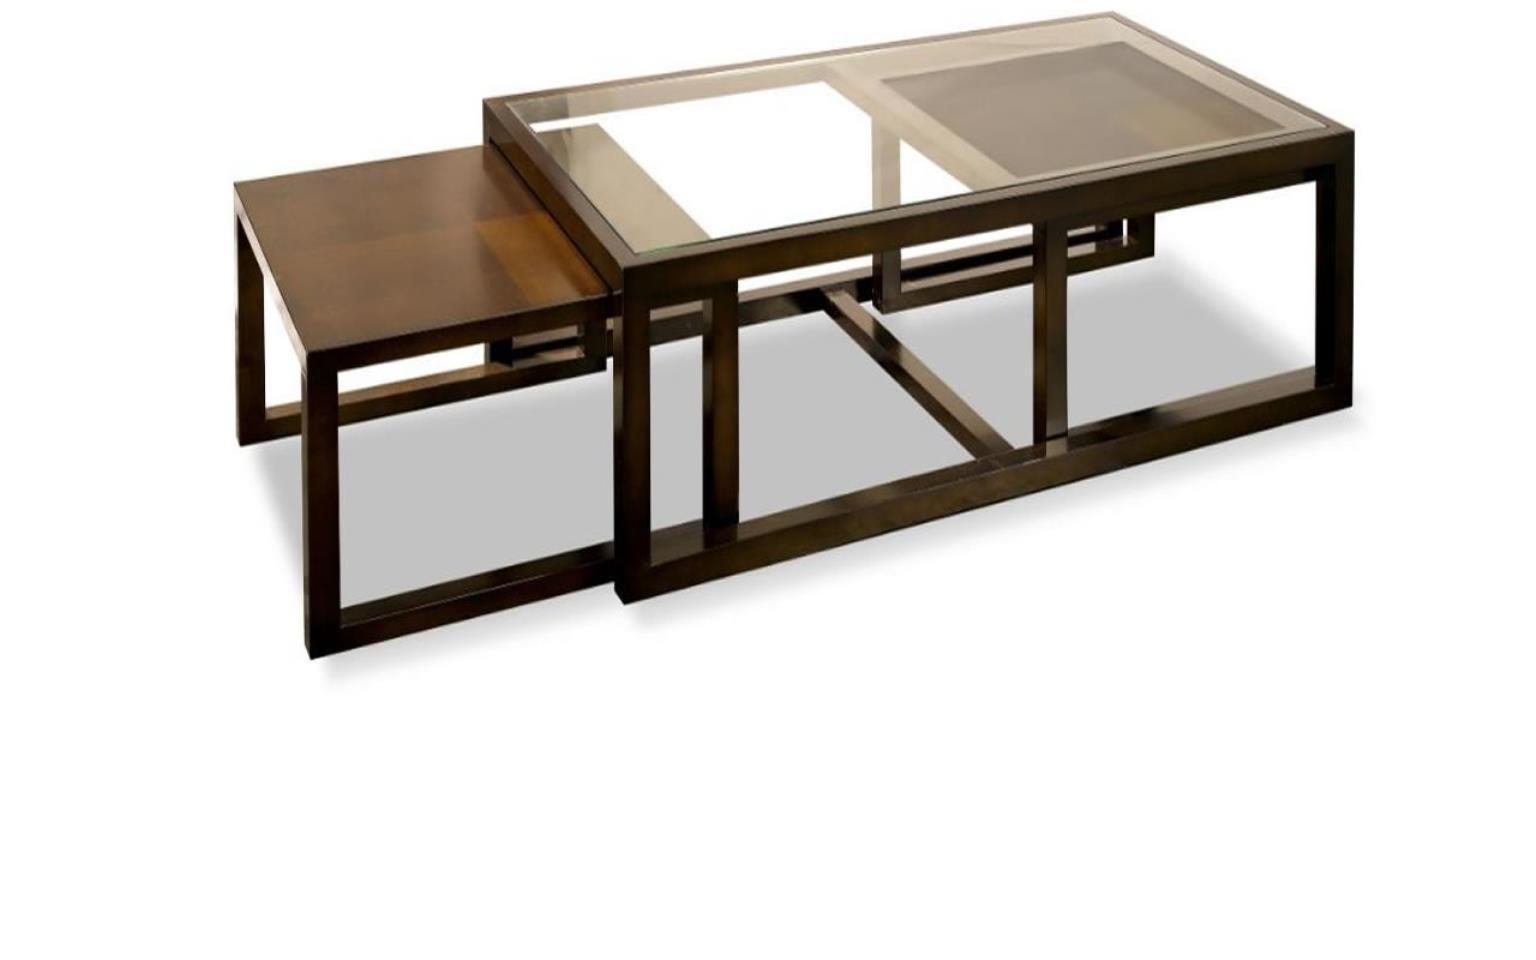 Hugues Chevalier Chez Maniglier Table Basse Design Deco